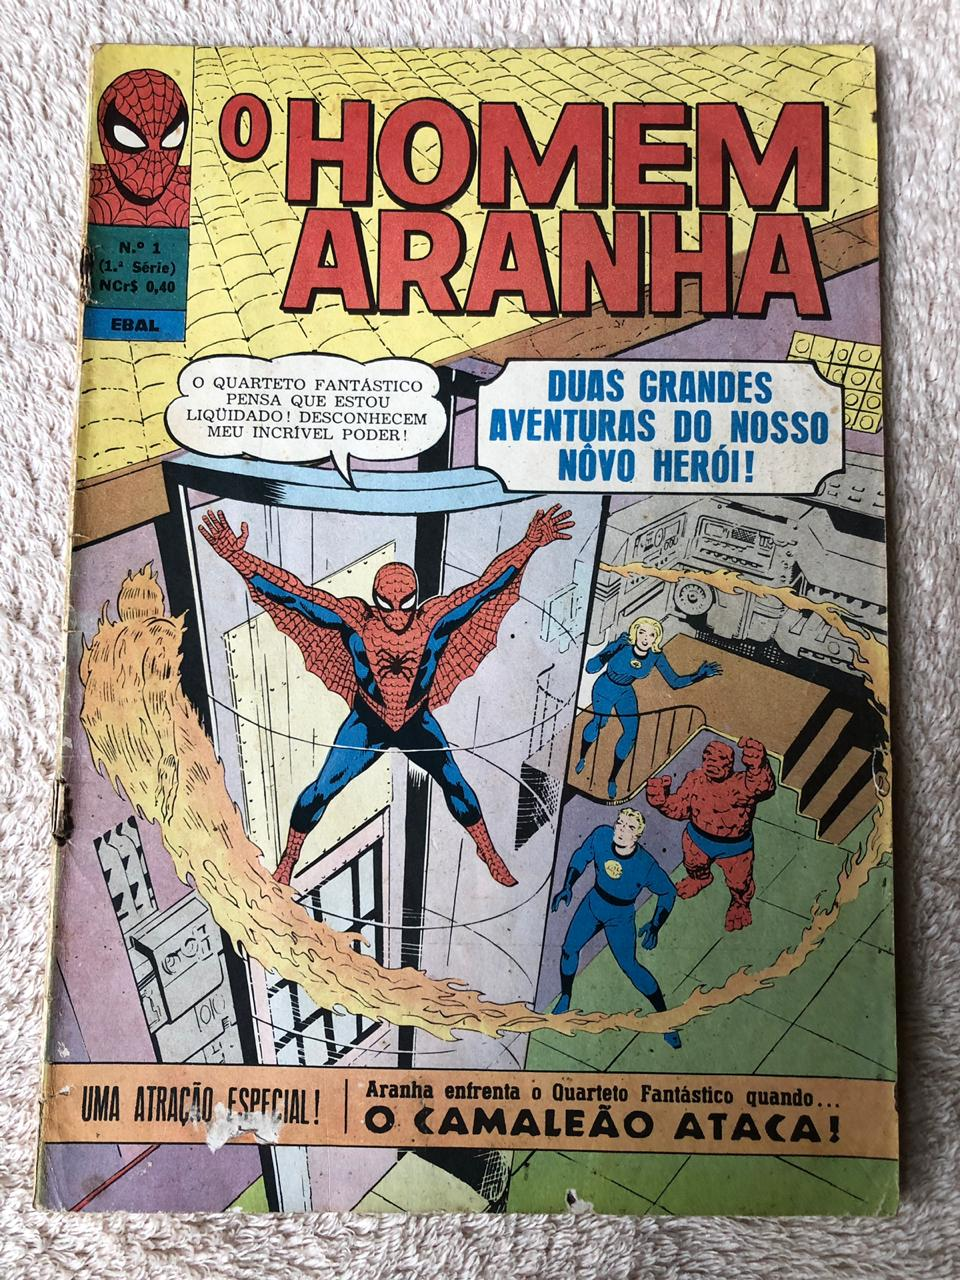 8° lote – Homem-Aranha n° 1 (Ed. Ebal, formato americano)